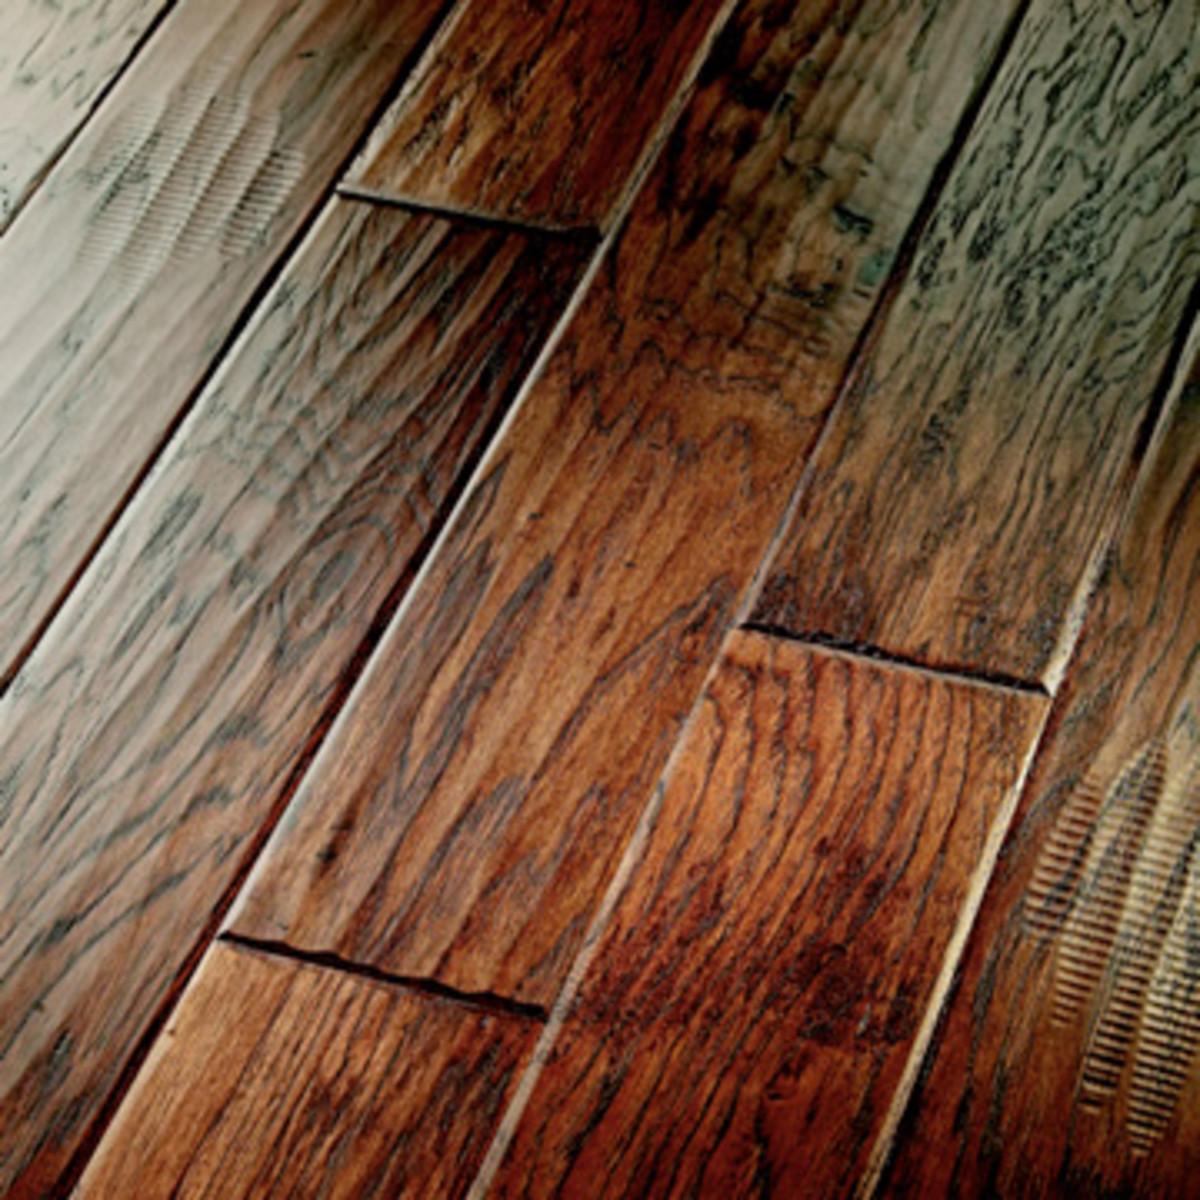 Hardwood Tile In Bathroom: Wood Tile: A Hardwood Substitute